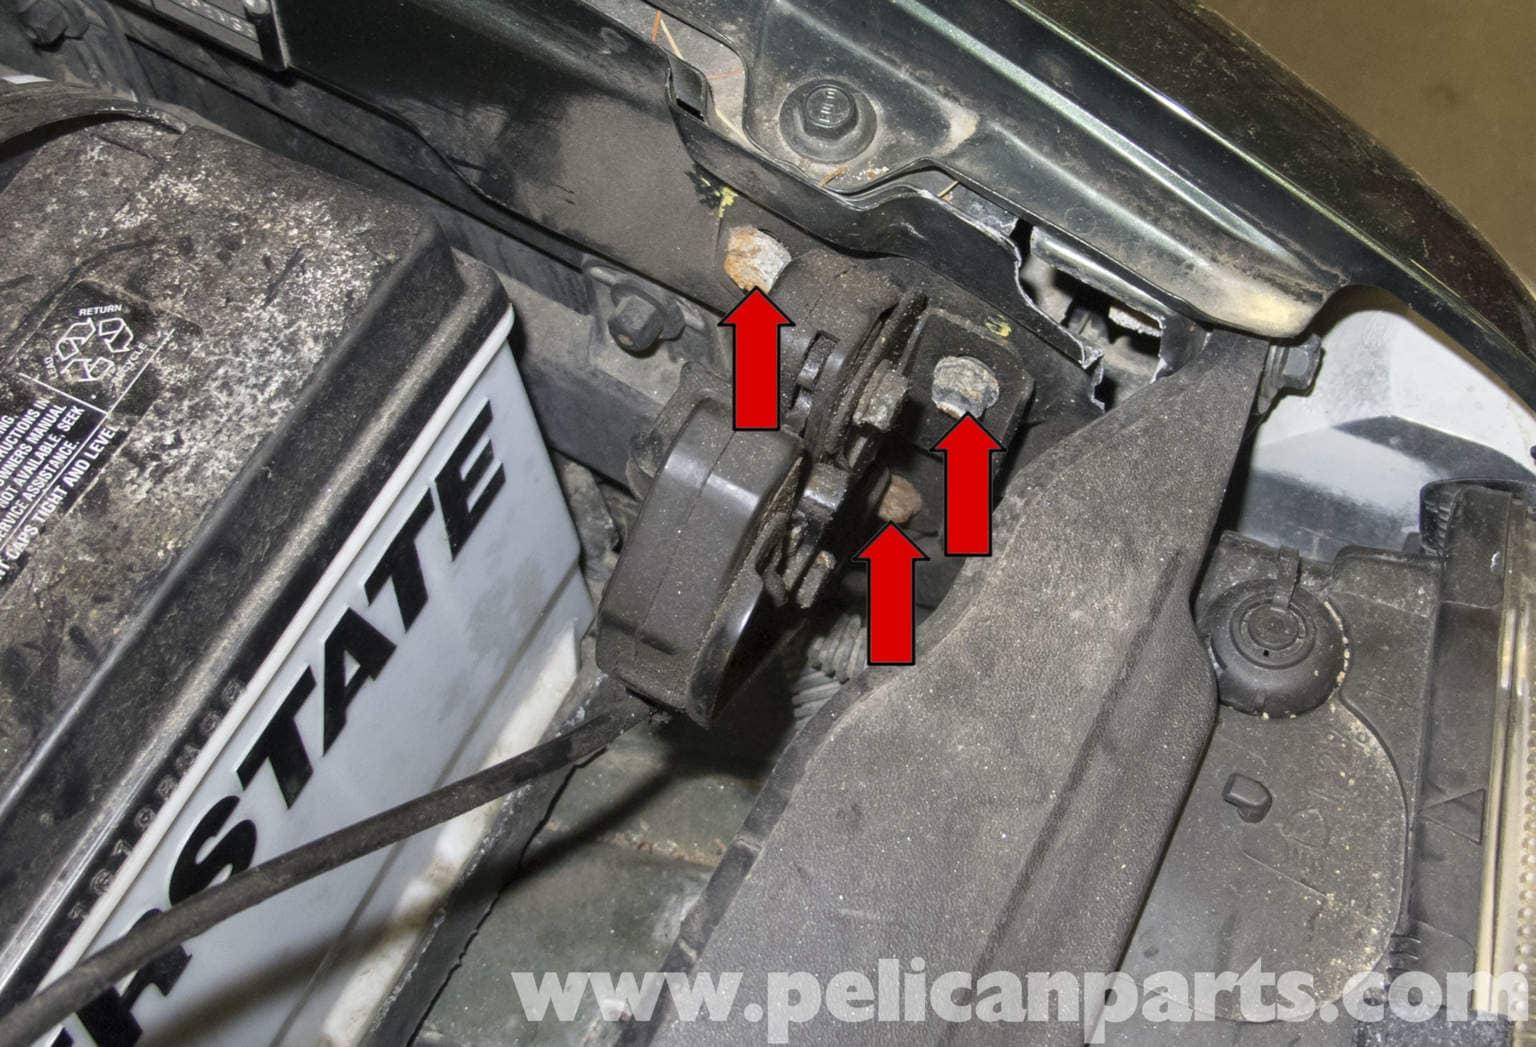 04 volvo xc90 wiring diagram ge profile refrigerator free engine image for